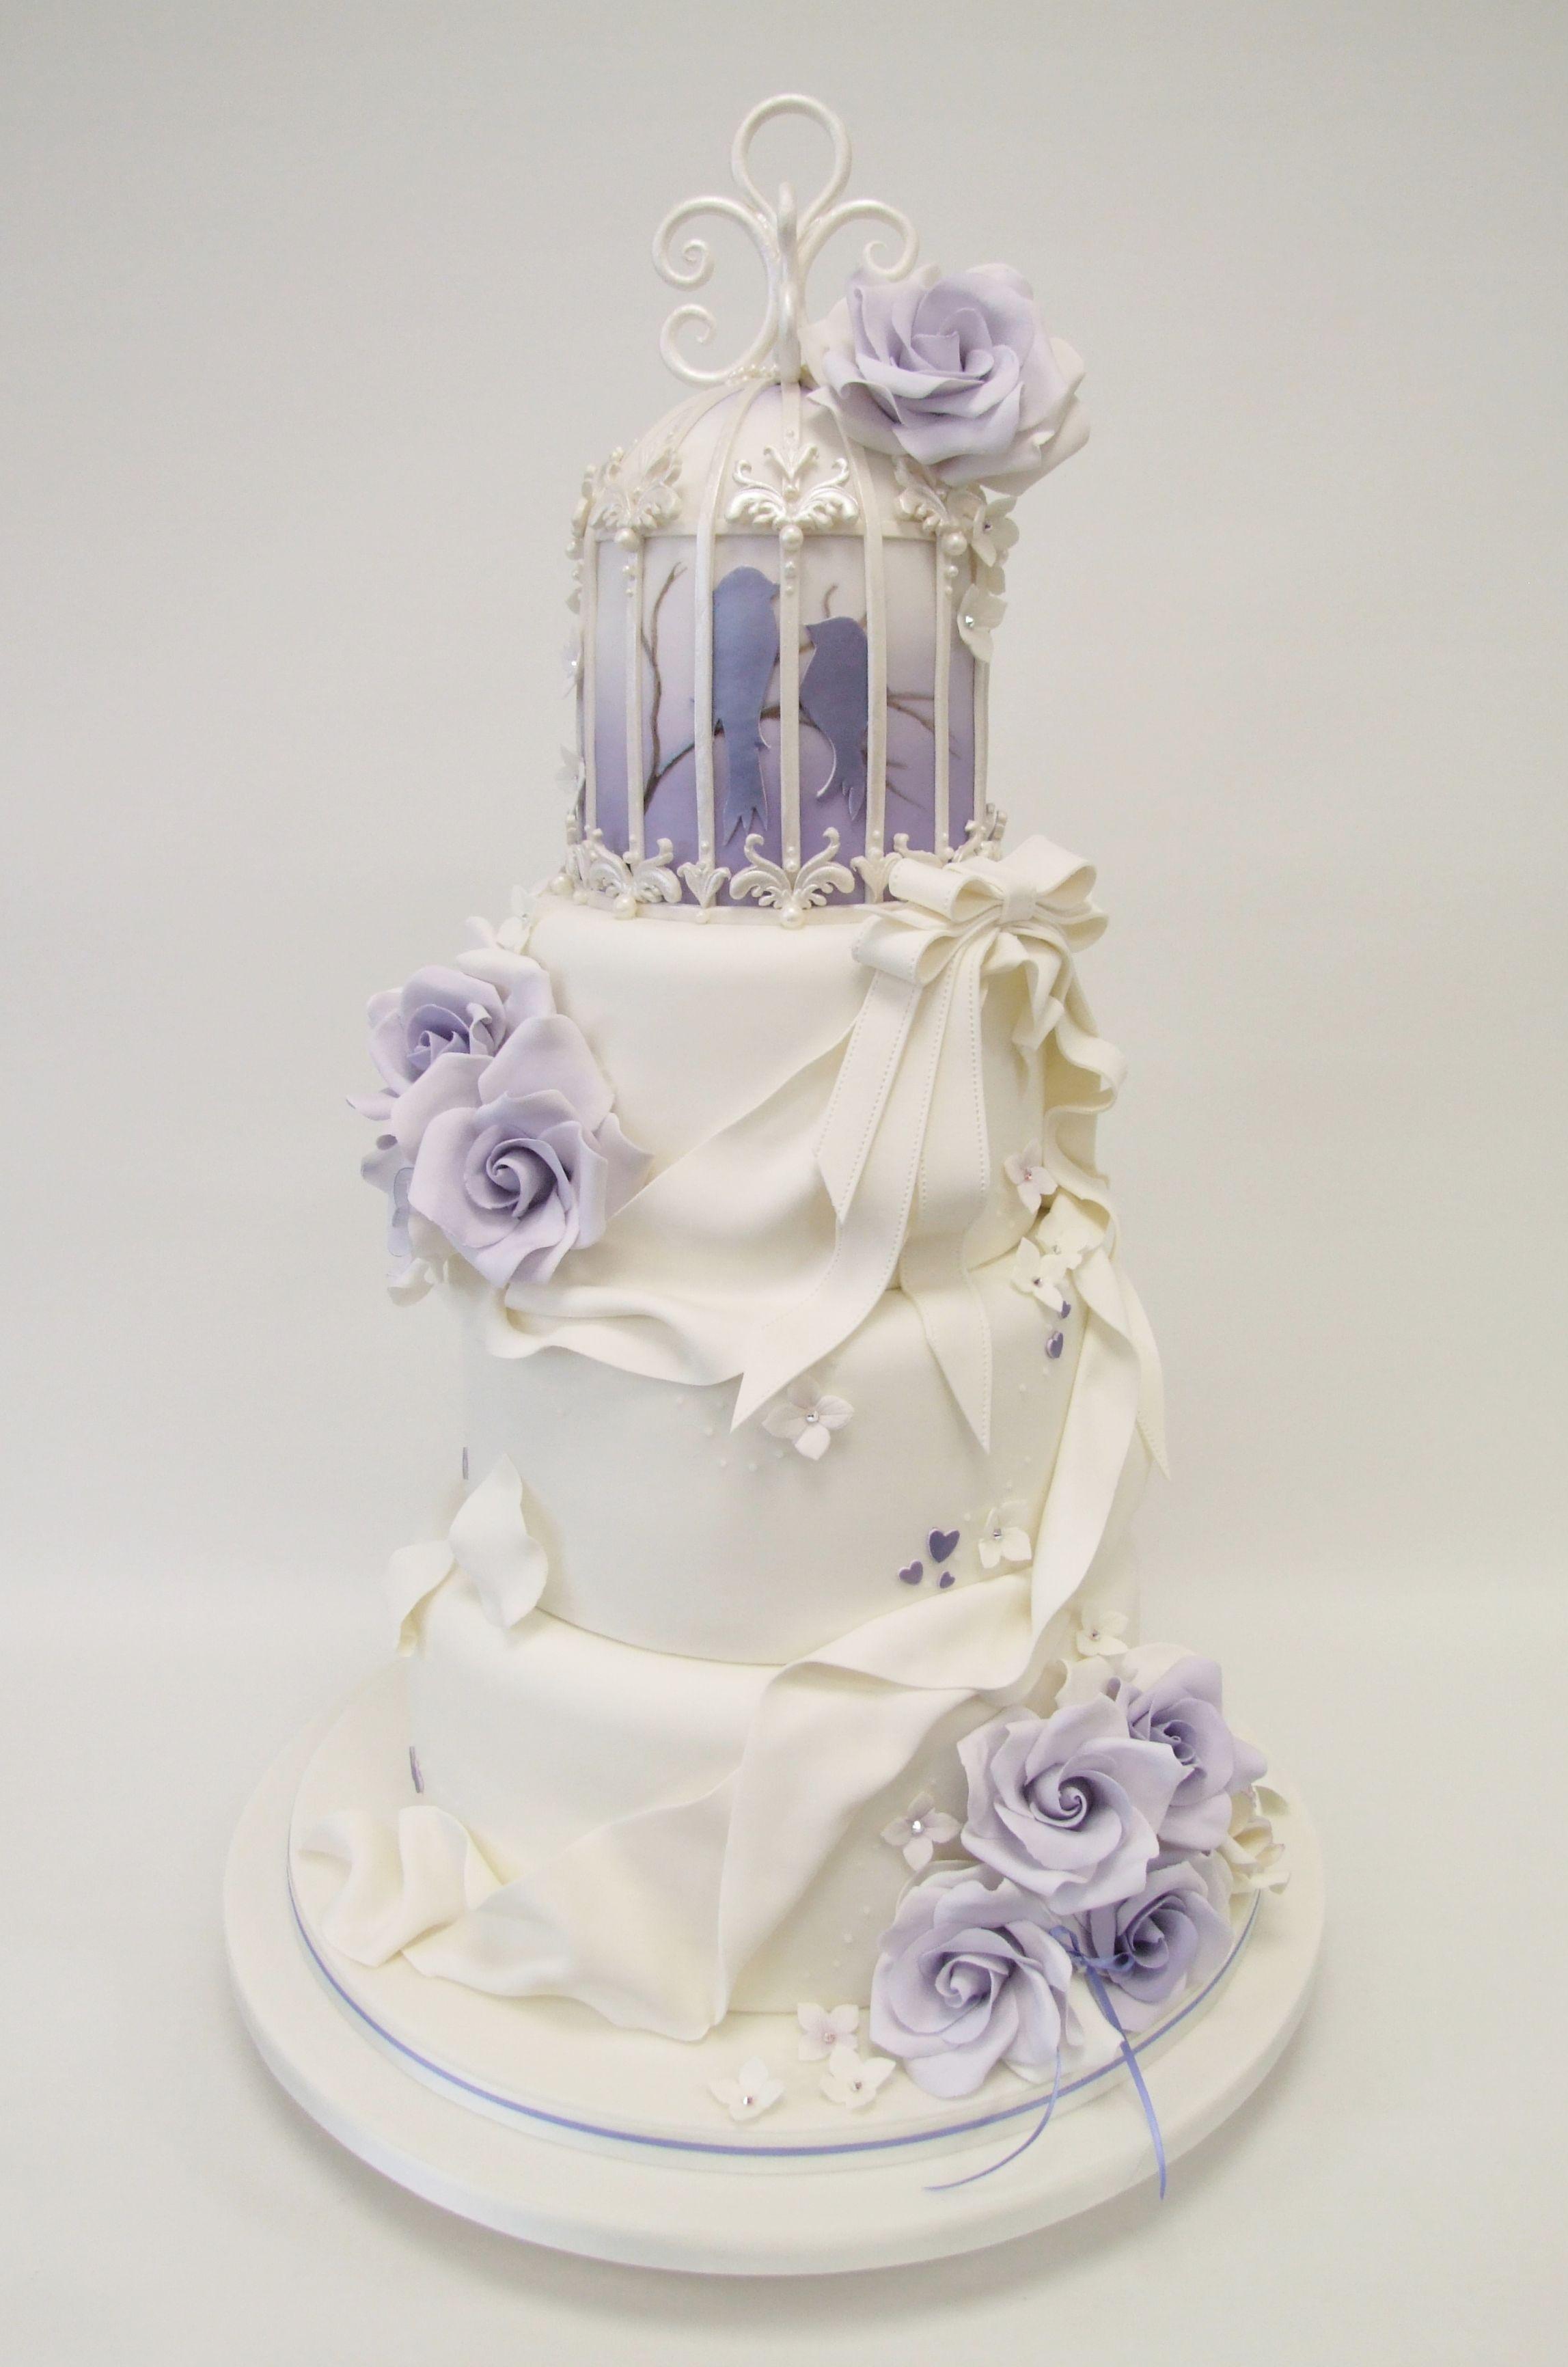 Emma Jayne Cake Design Beautiful cake pictures, Wedding